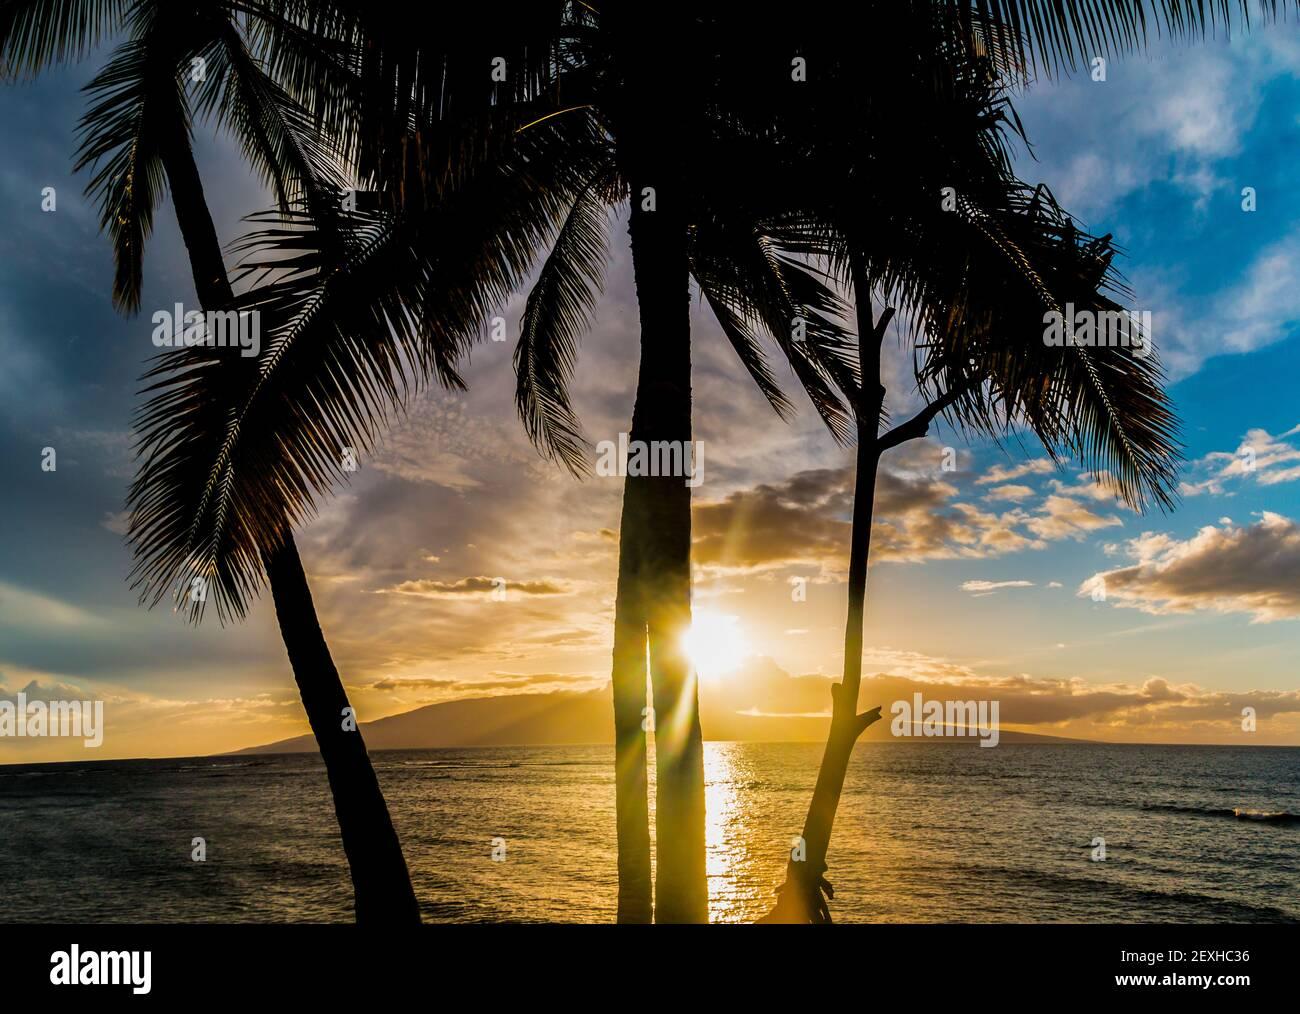 Sunset Over Lanai With Palm Tree Silhouette, Across Lahaina Bay, Maui, Hawaii, USA Stock Photo